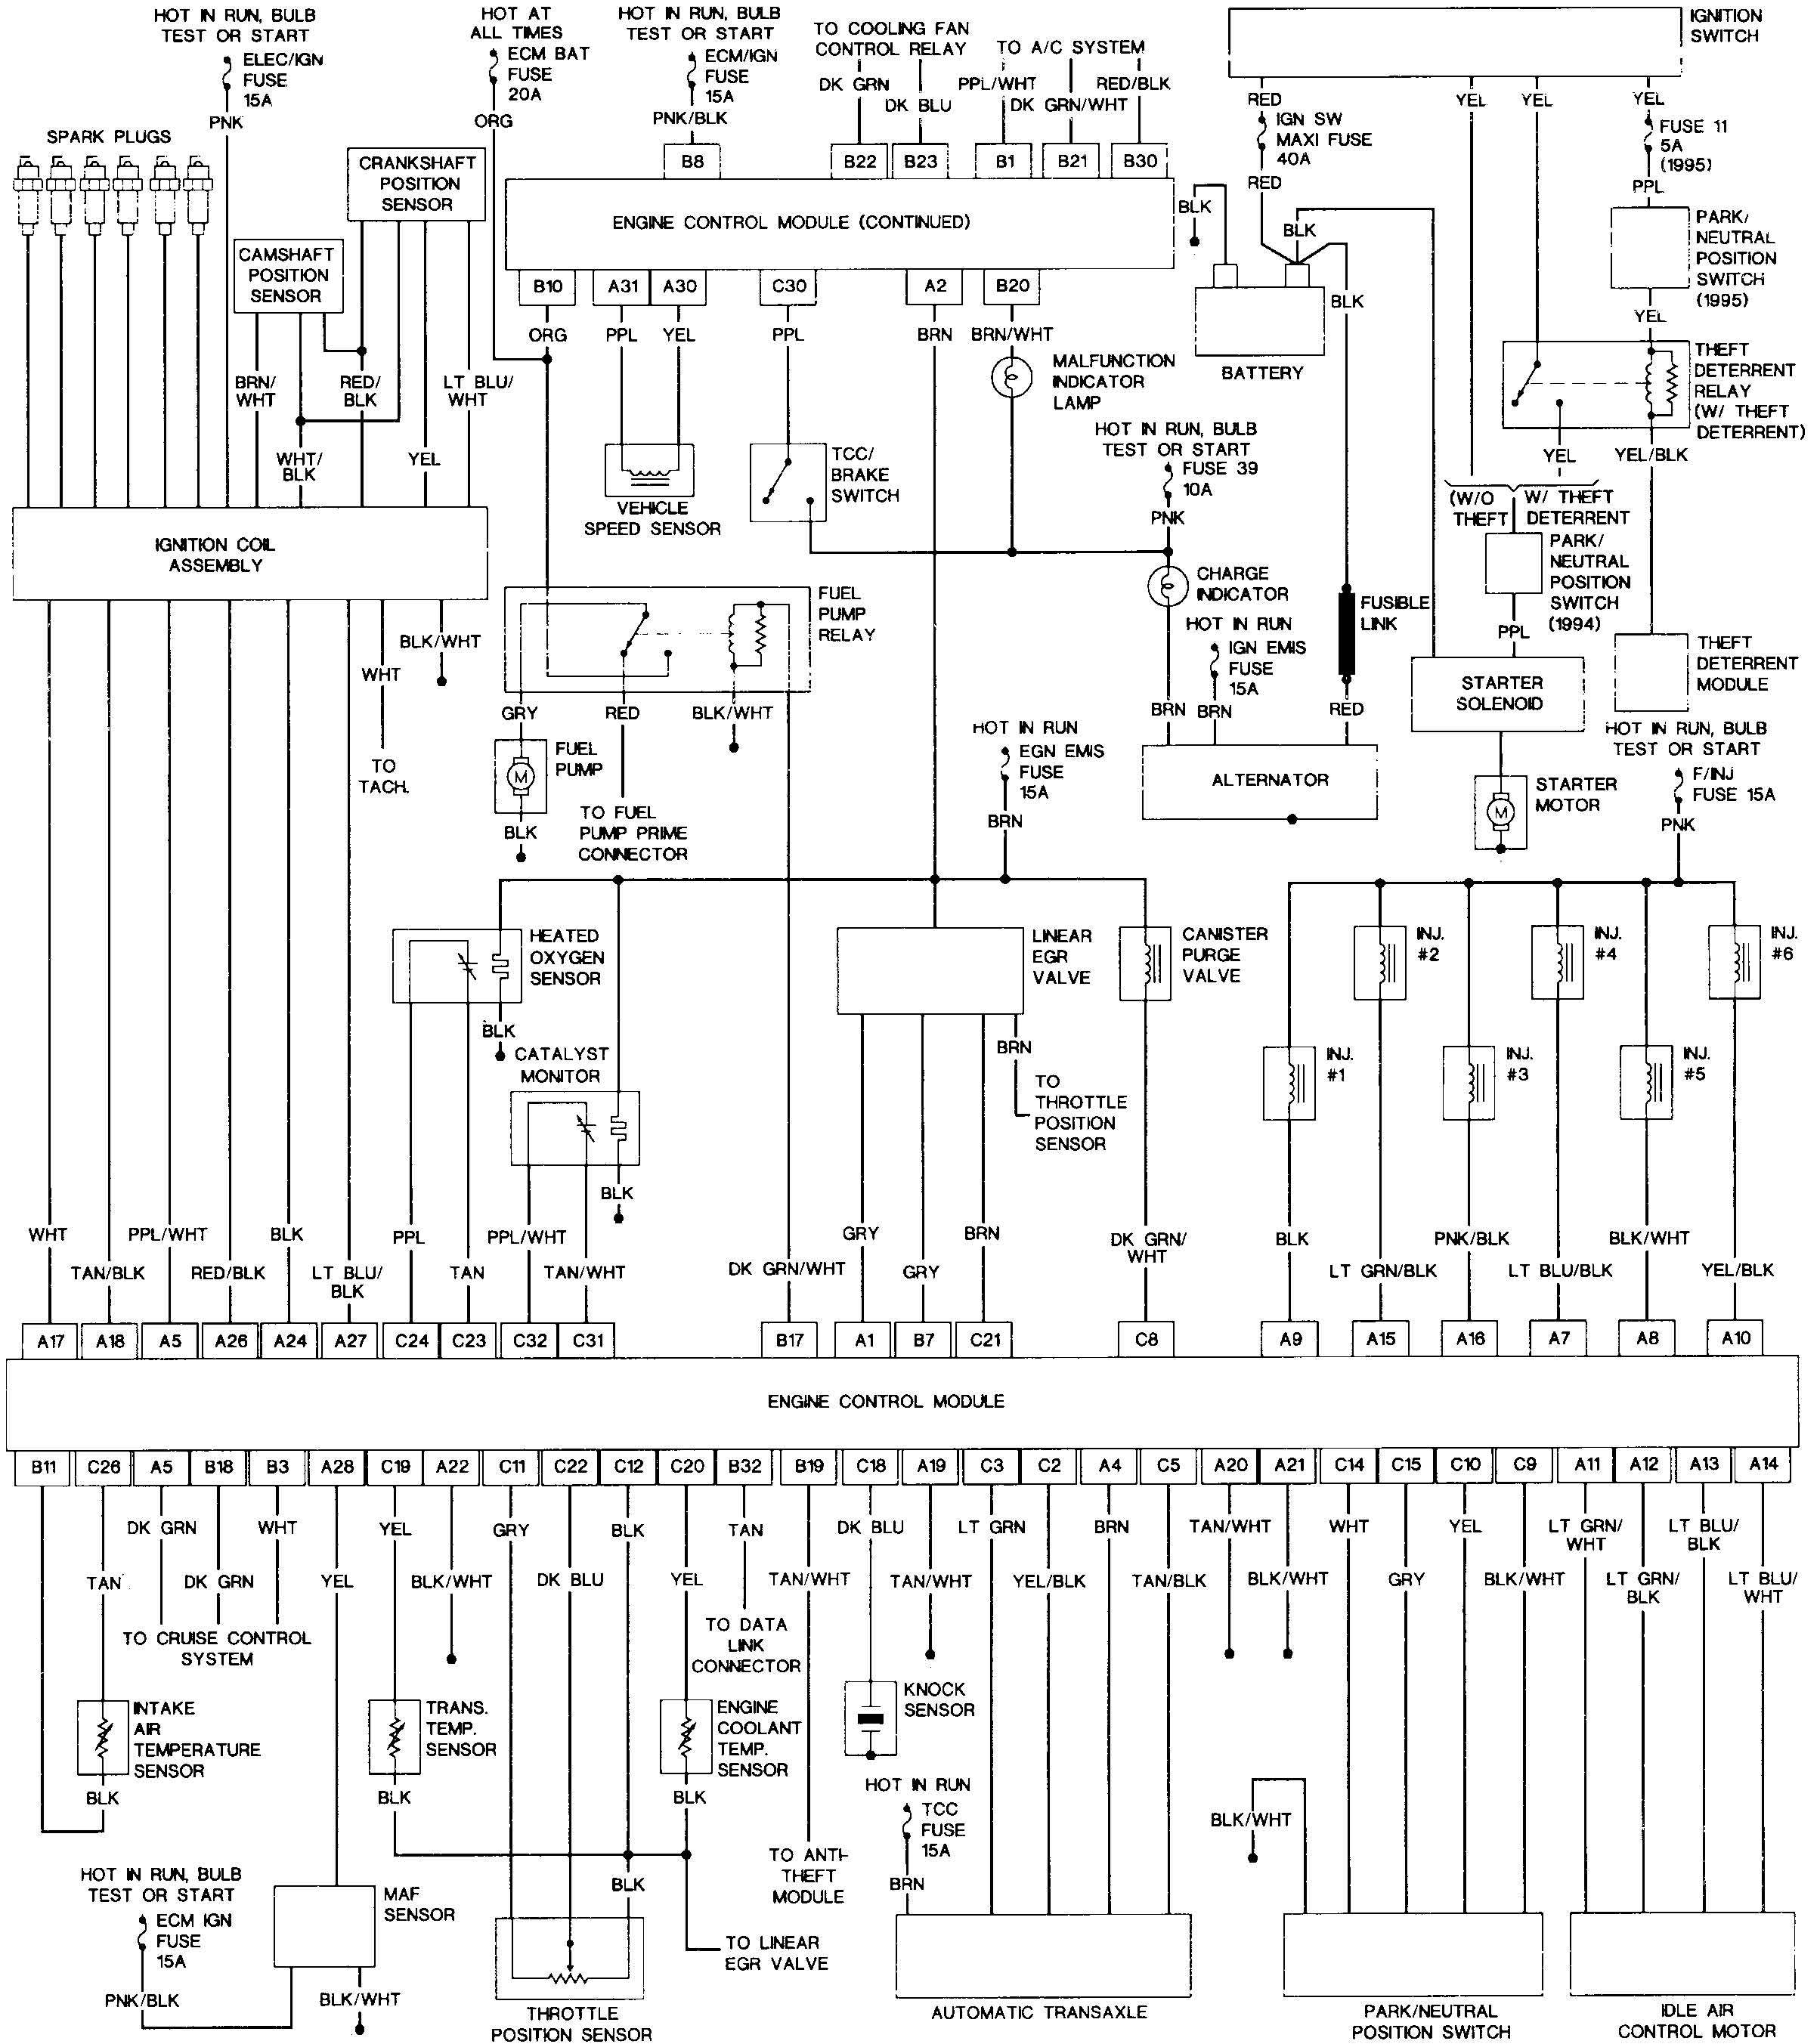 Boston Acoustics Jeep Patriot Wiring Diagram - Toyota V6 Engine Parts  Diagram for Wiring Diagram SchematicsWiring Diagram Schematics